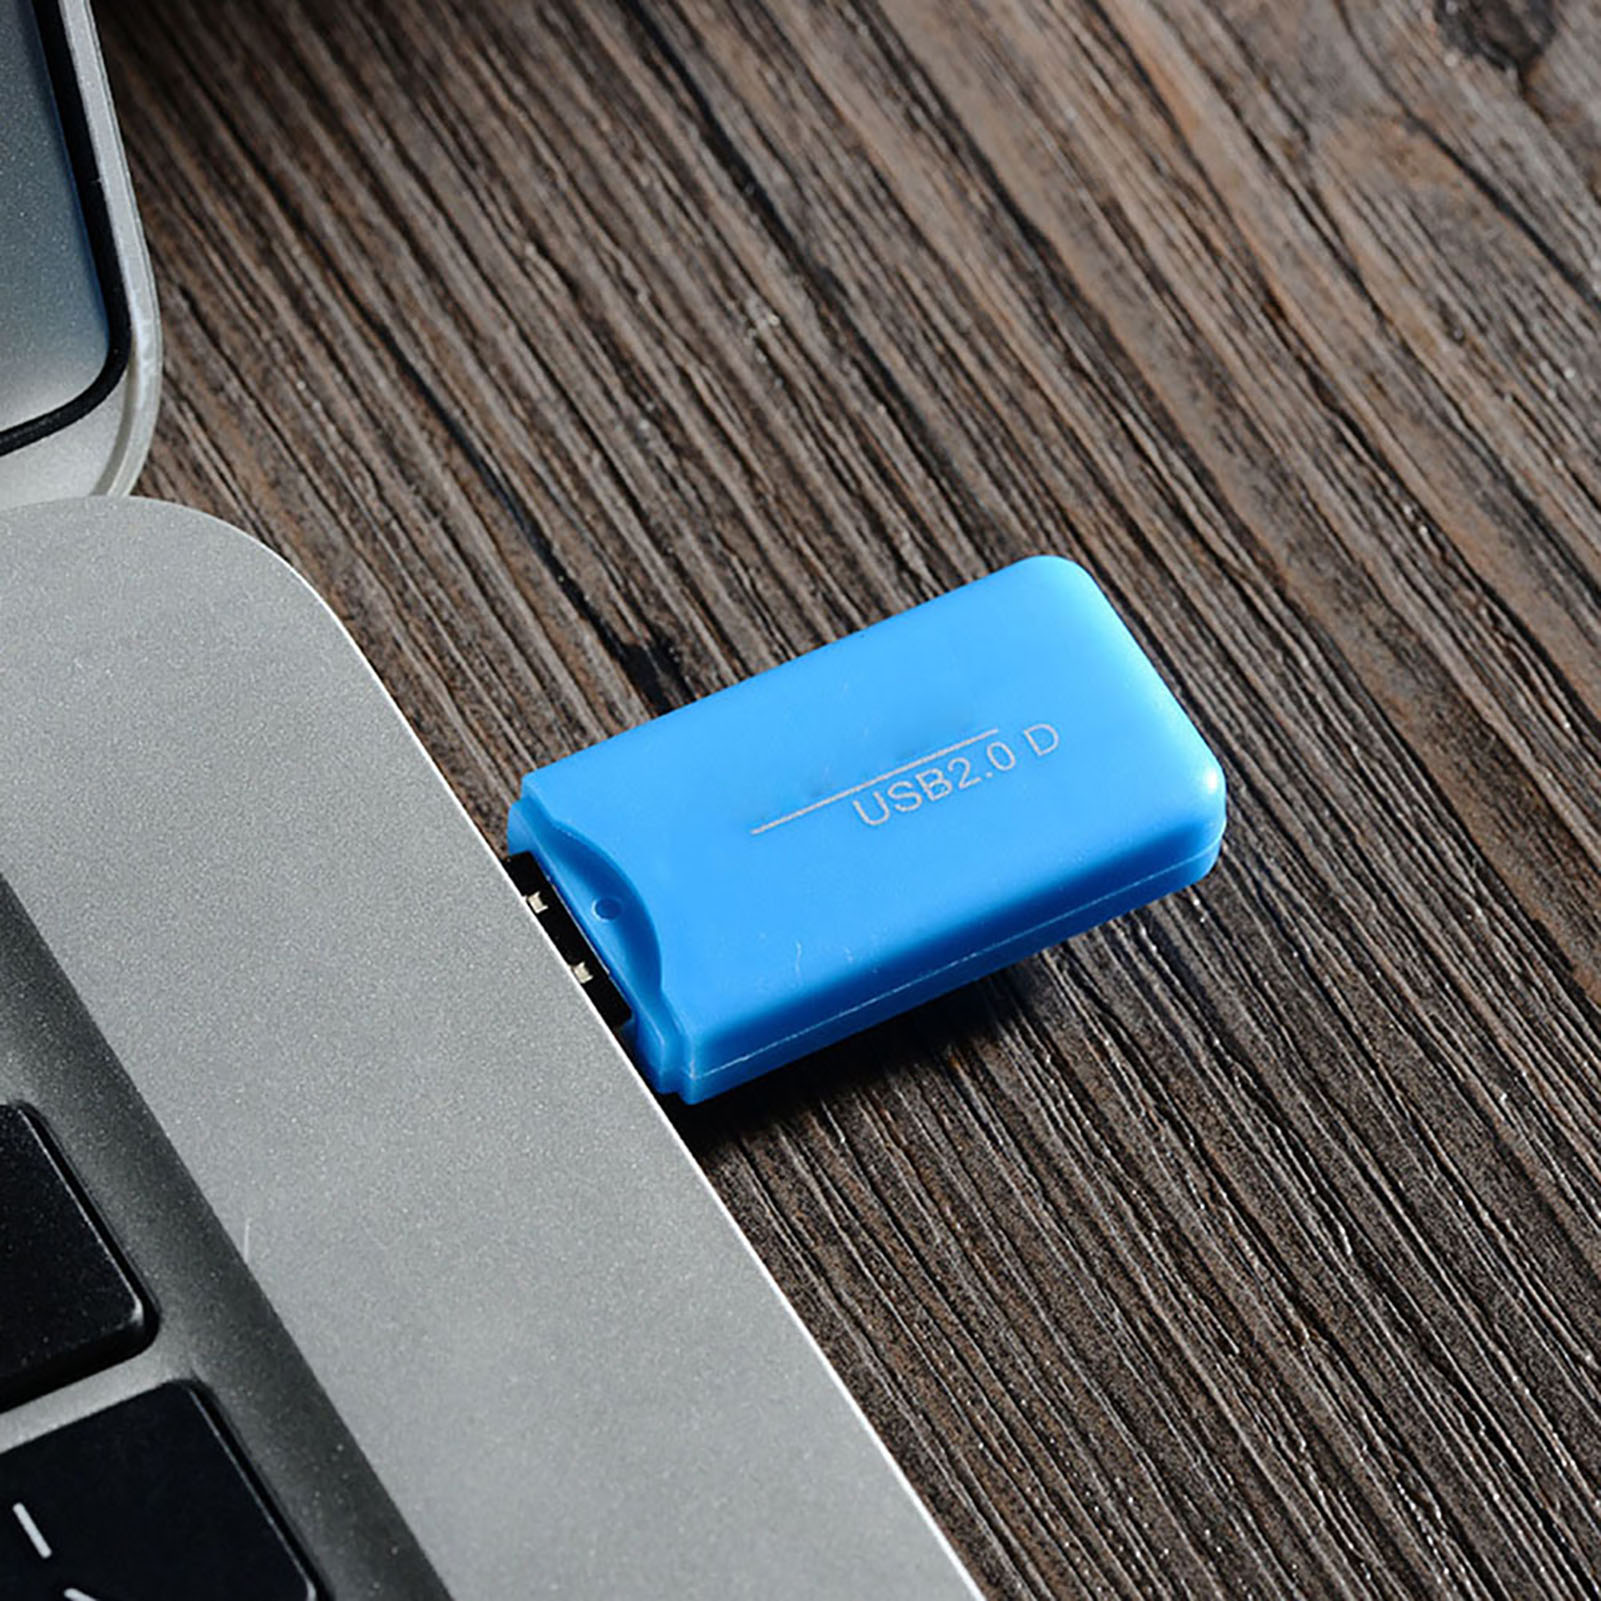 Mini USB 2.0 TF Micro Security Digital Memory Card Reader Adapter for Laptop